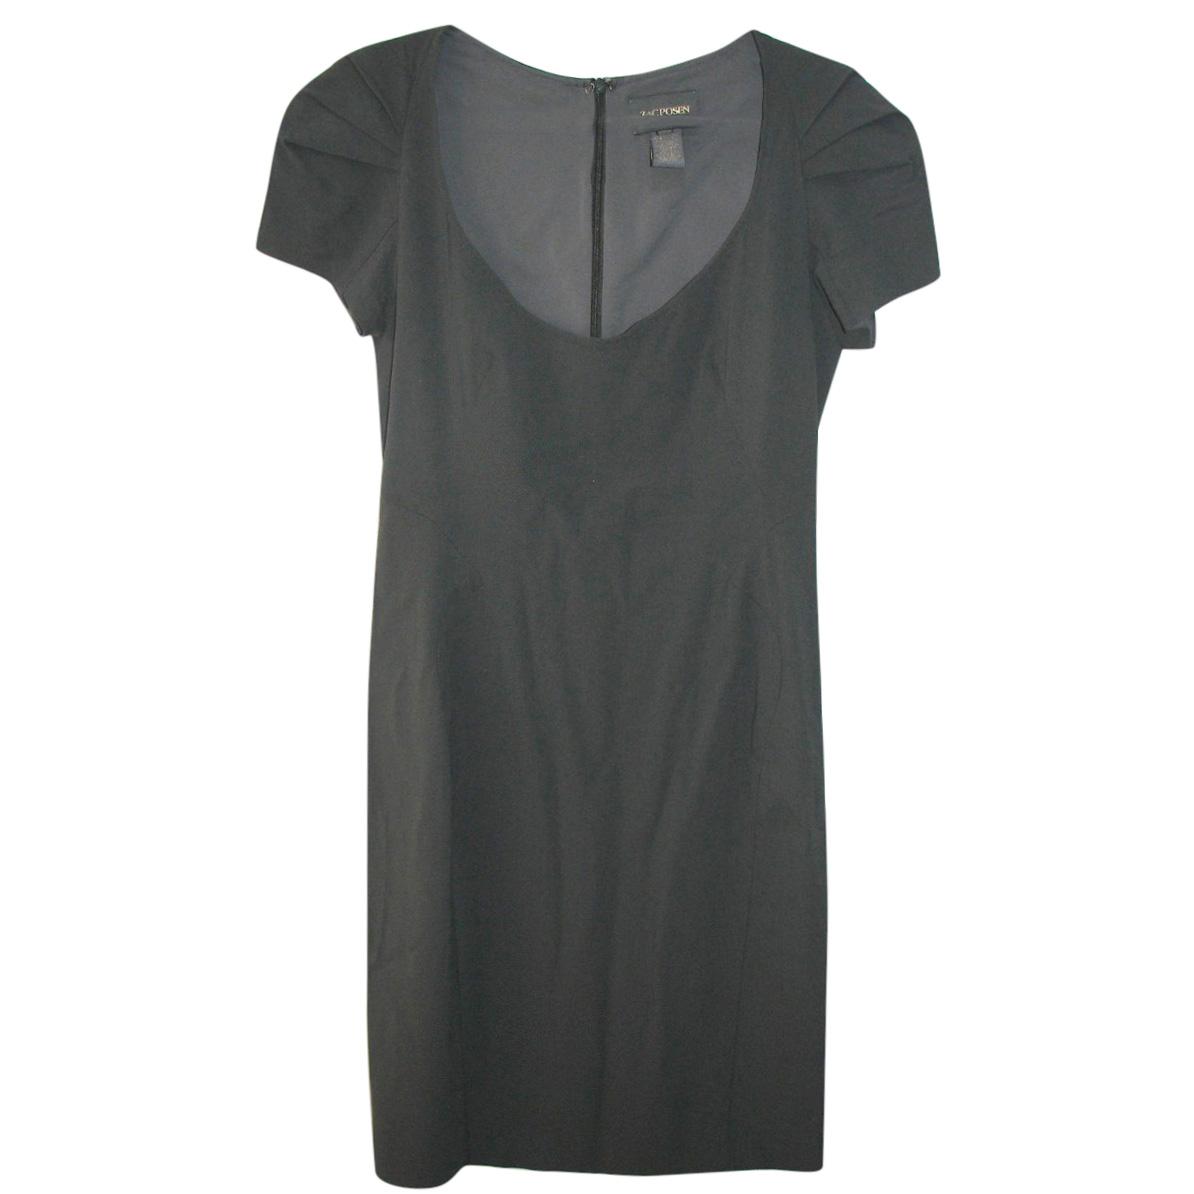 Zac Posen fitted grey dress